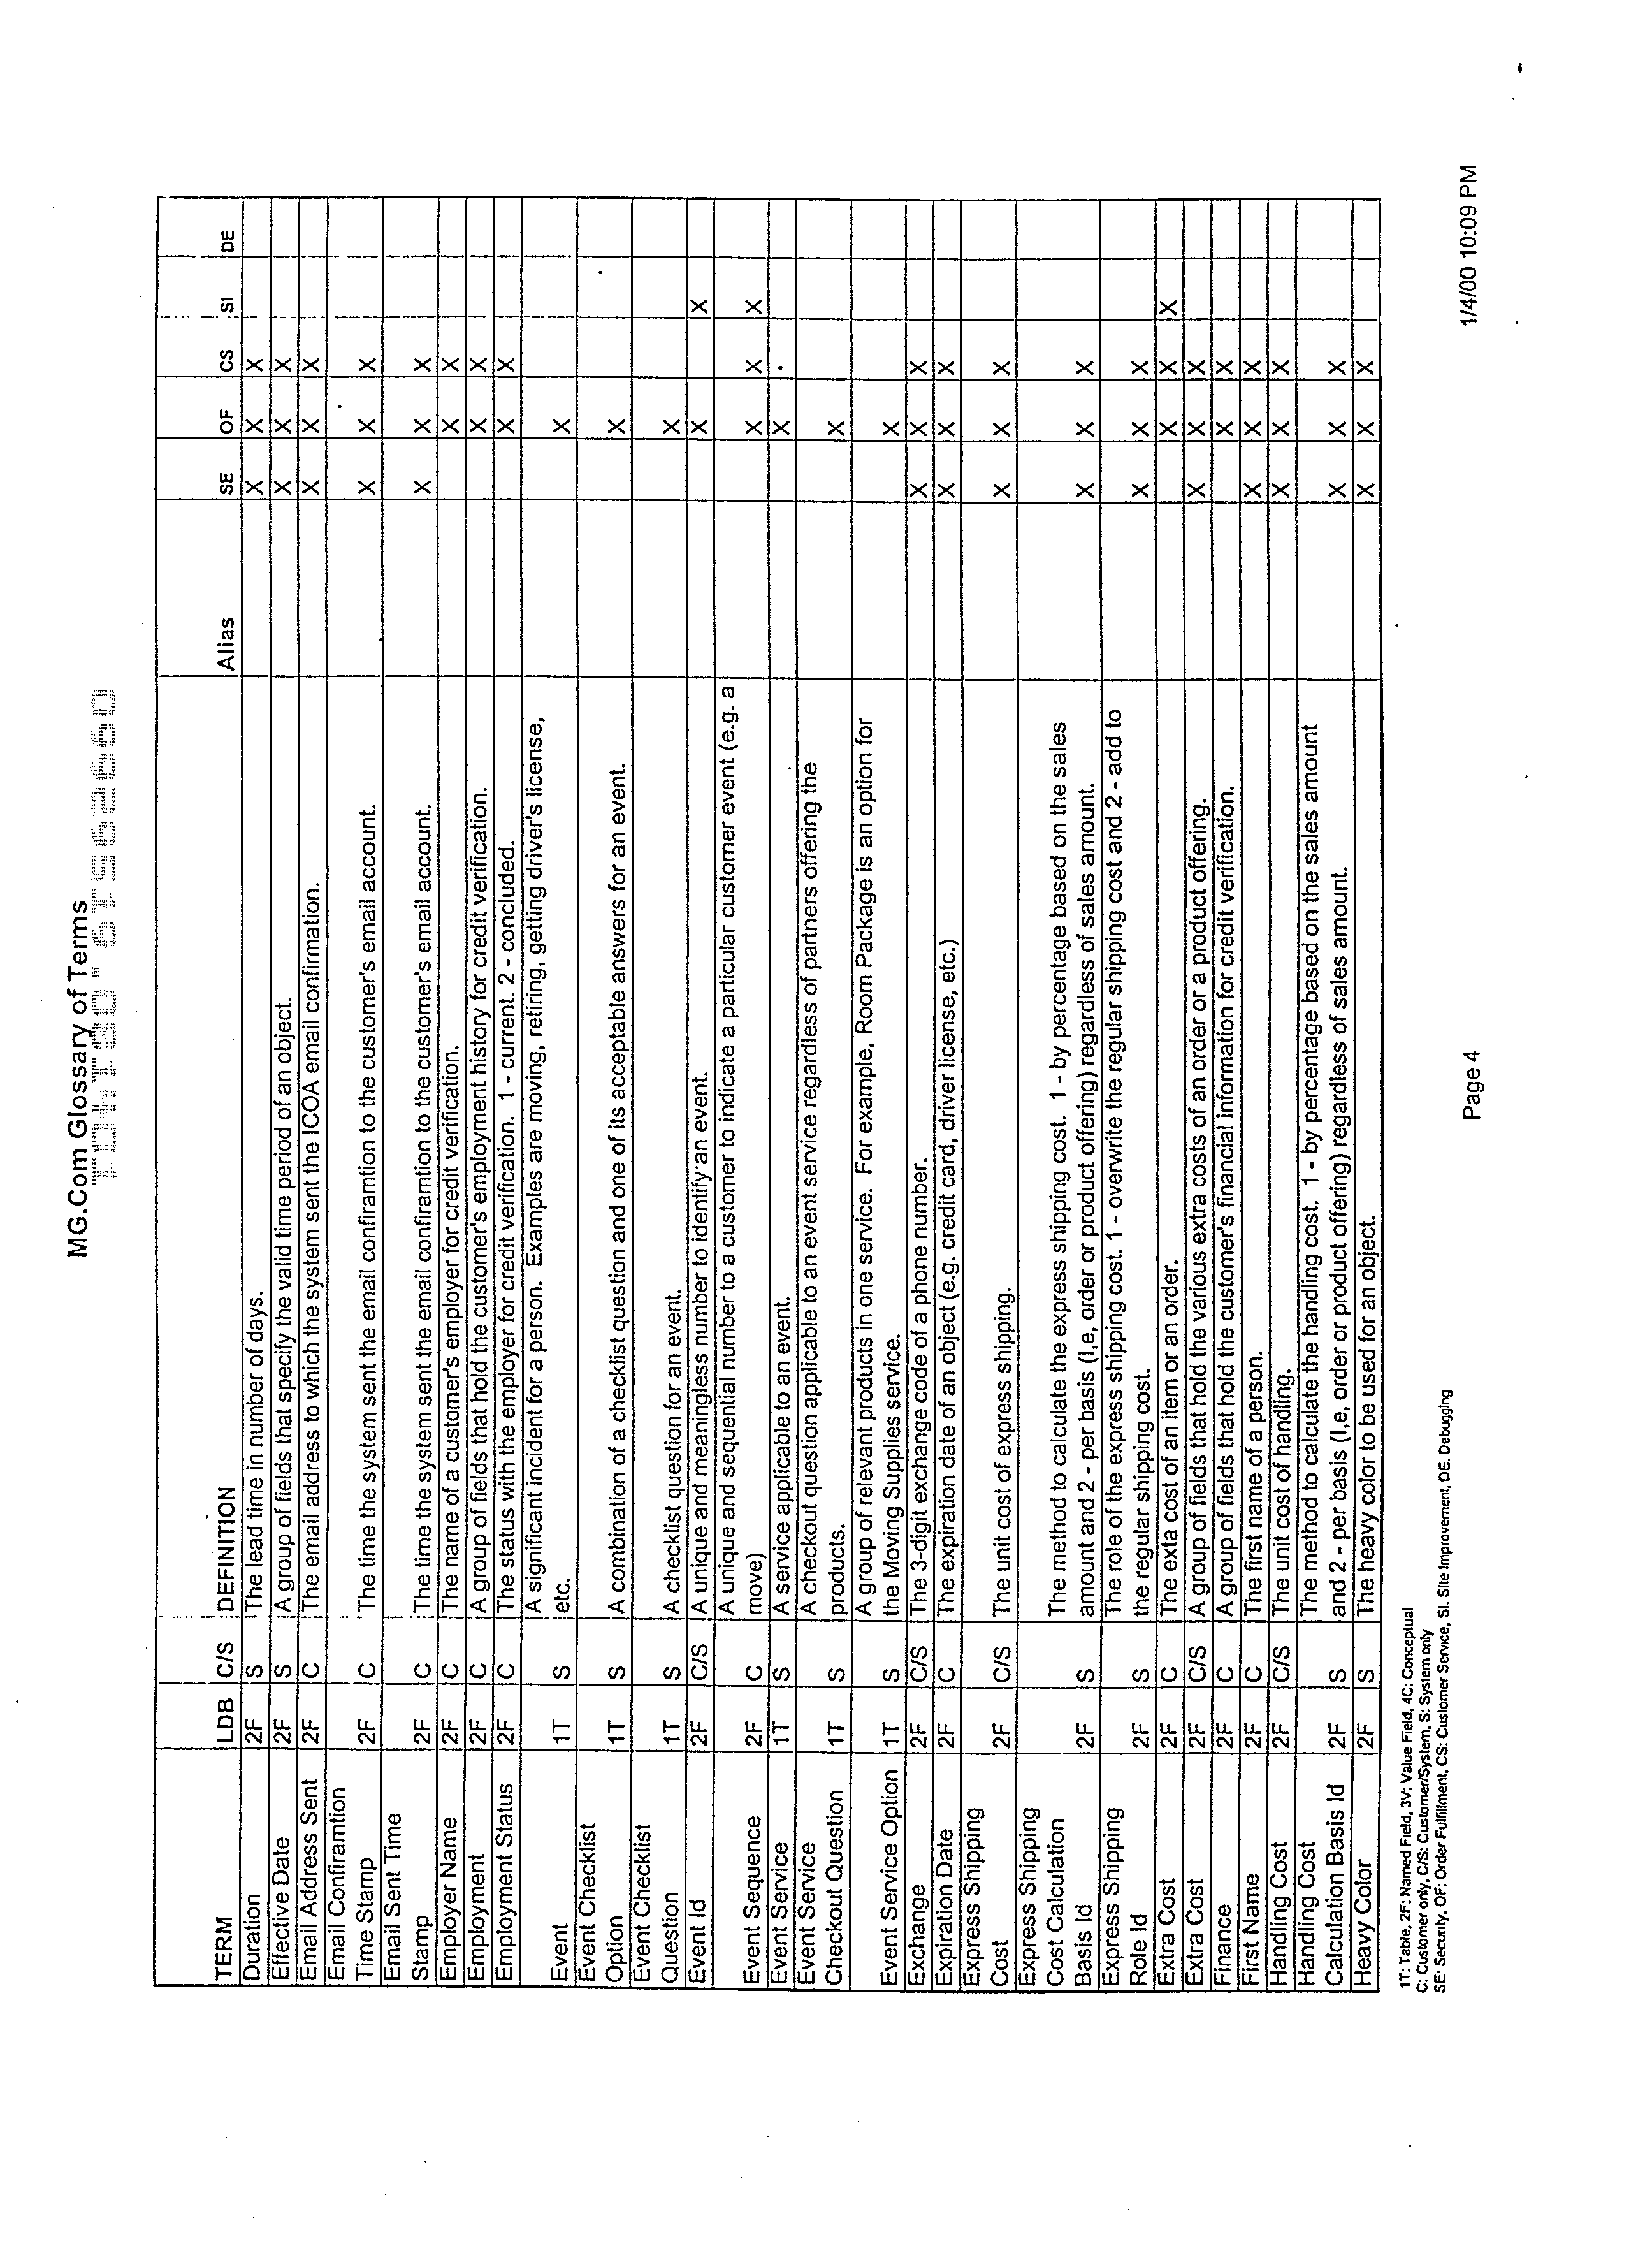 Figure US20020032721A1-20020314-P00025